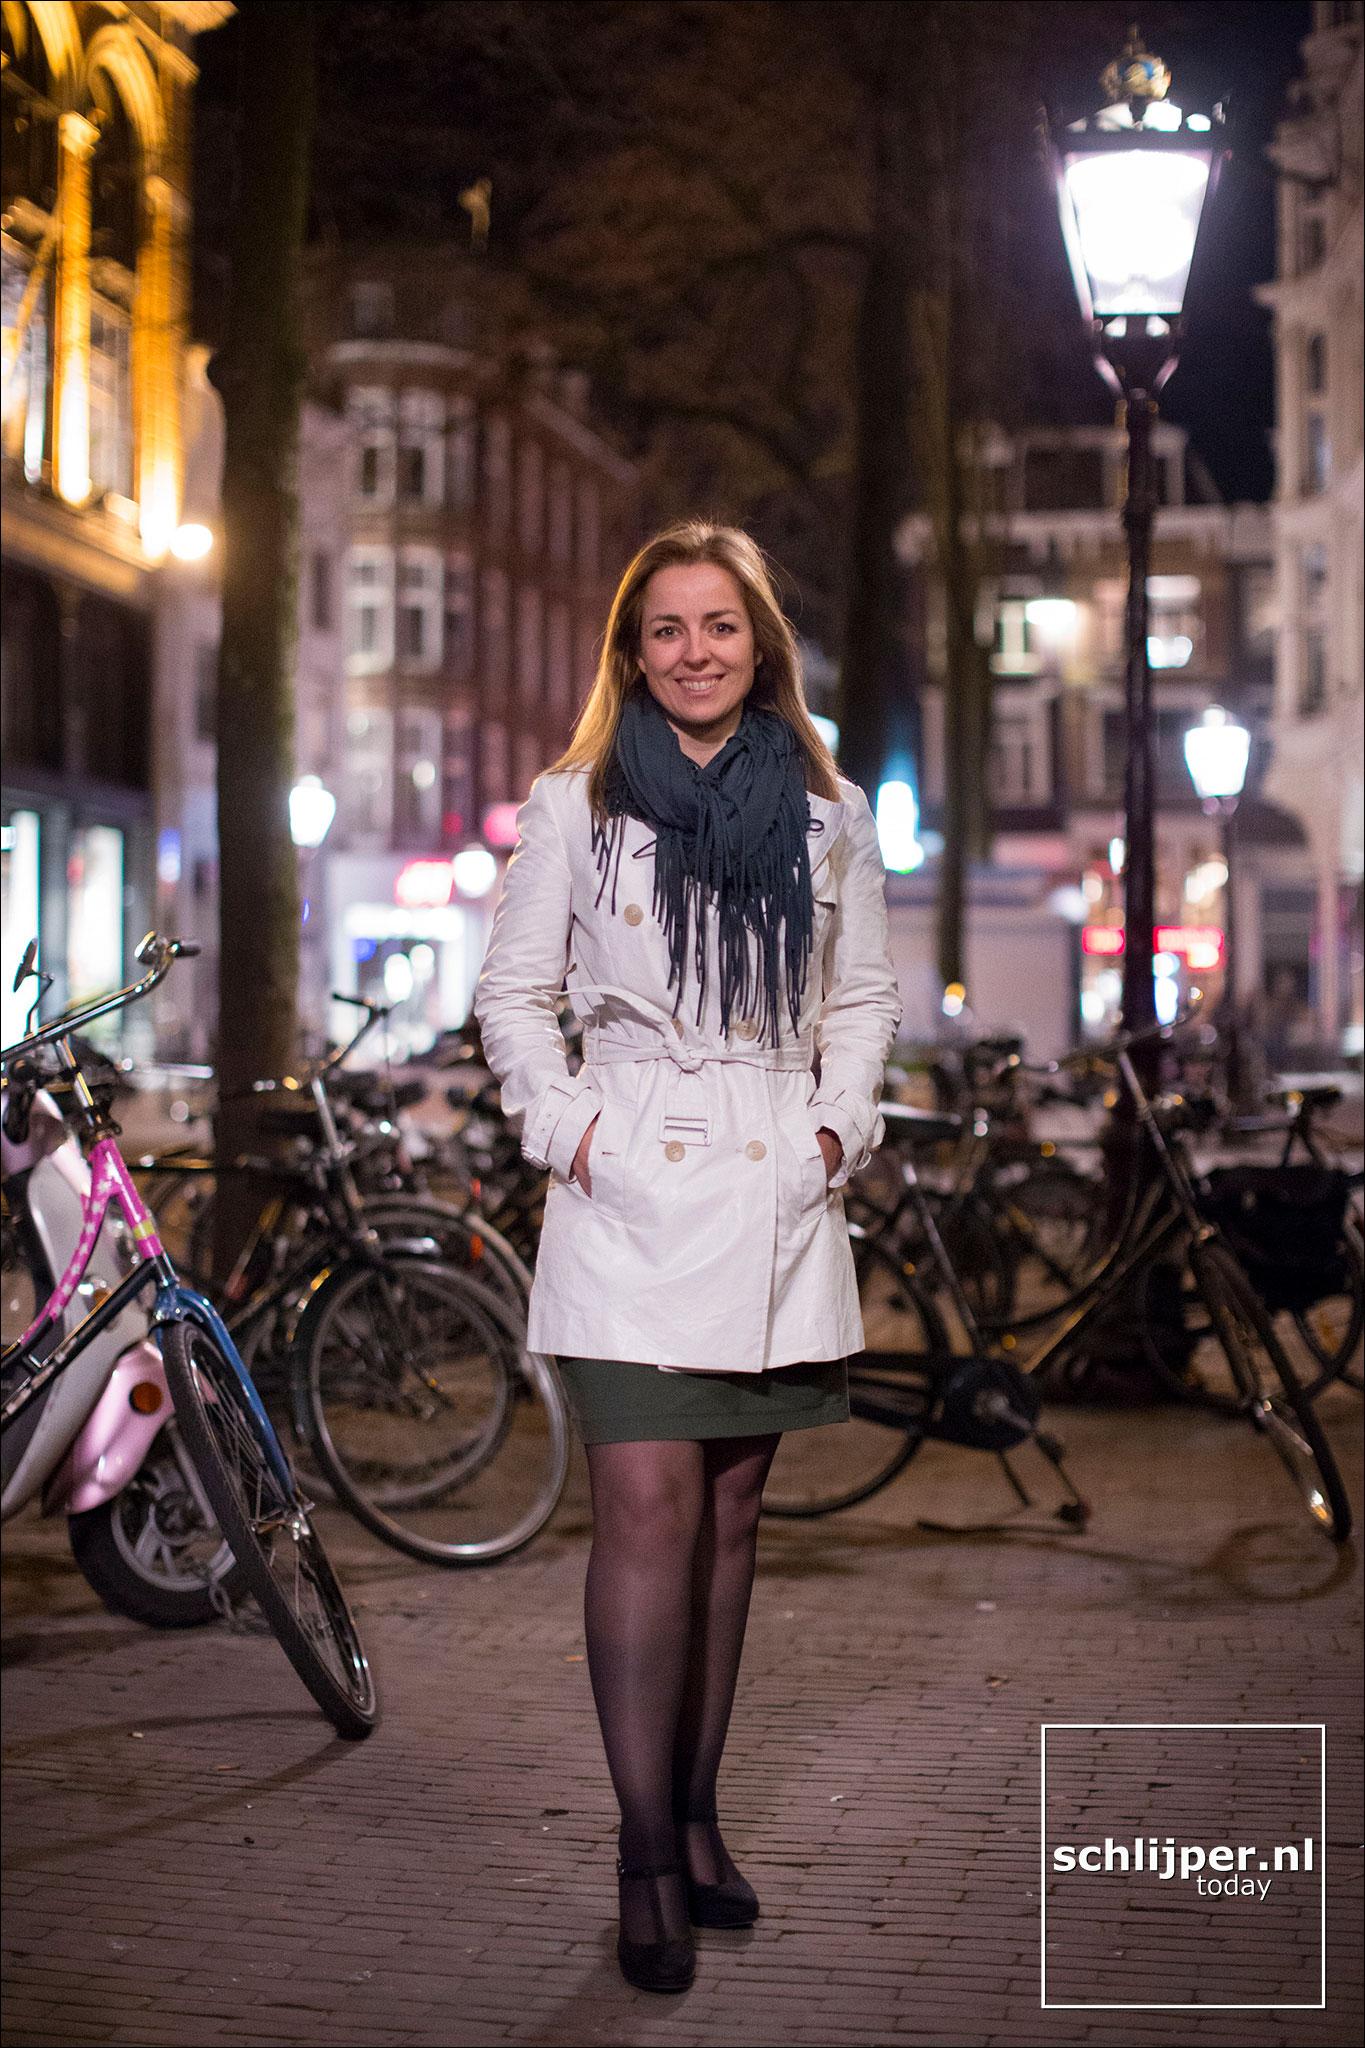 Nederland, Amsterdam, 11 maart 2015